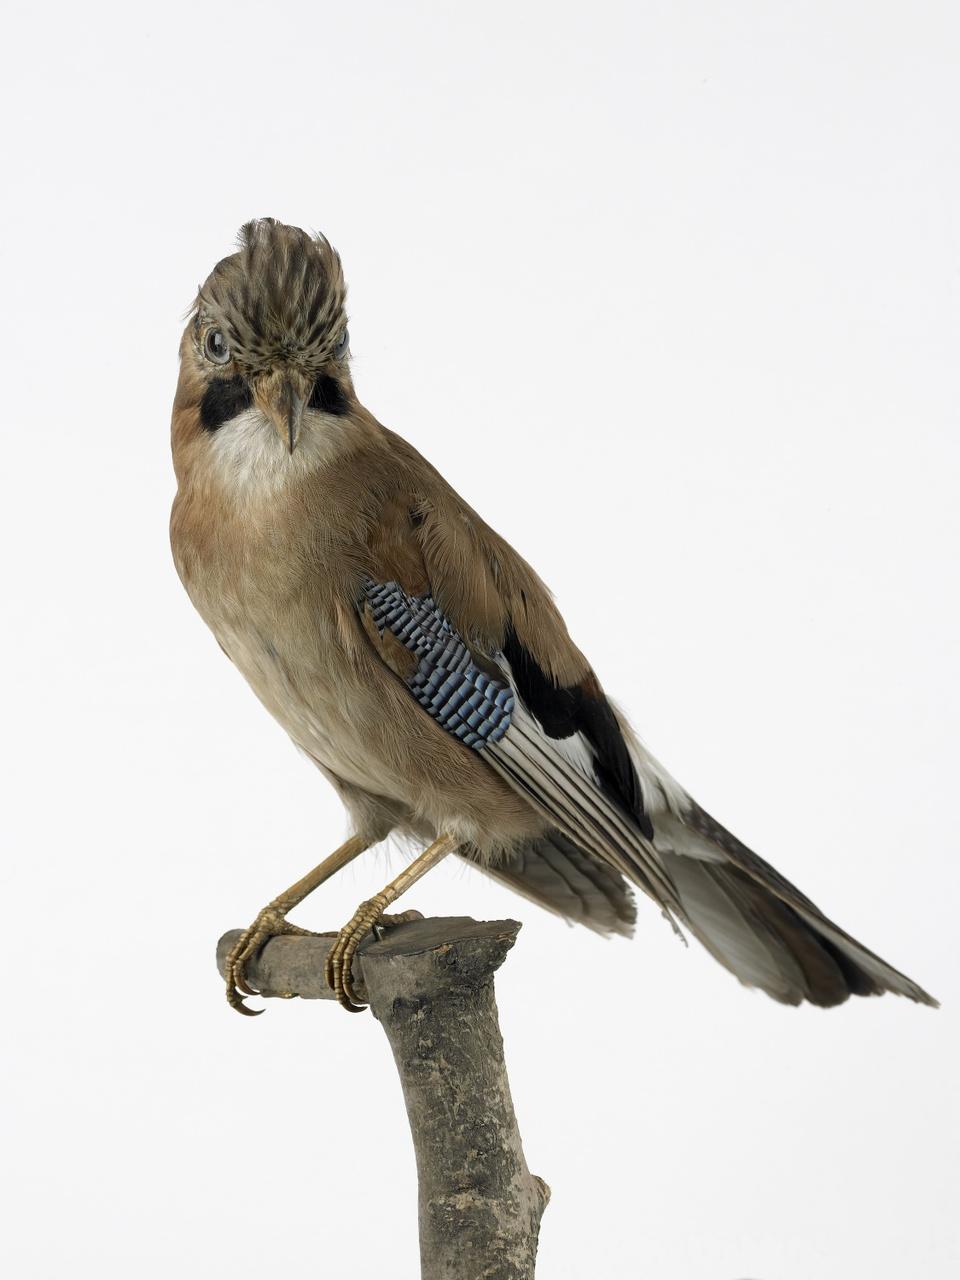 Garrulus glandarius (Linnaeus, 1758), Vlaamse gaai, opgezette vogel